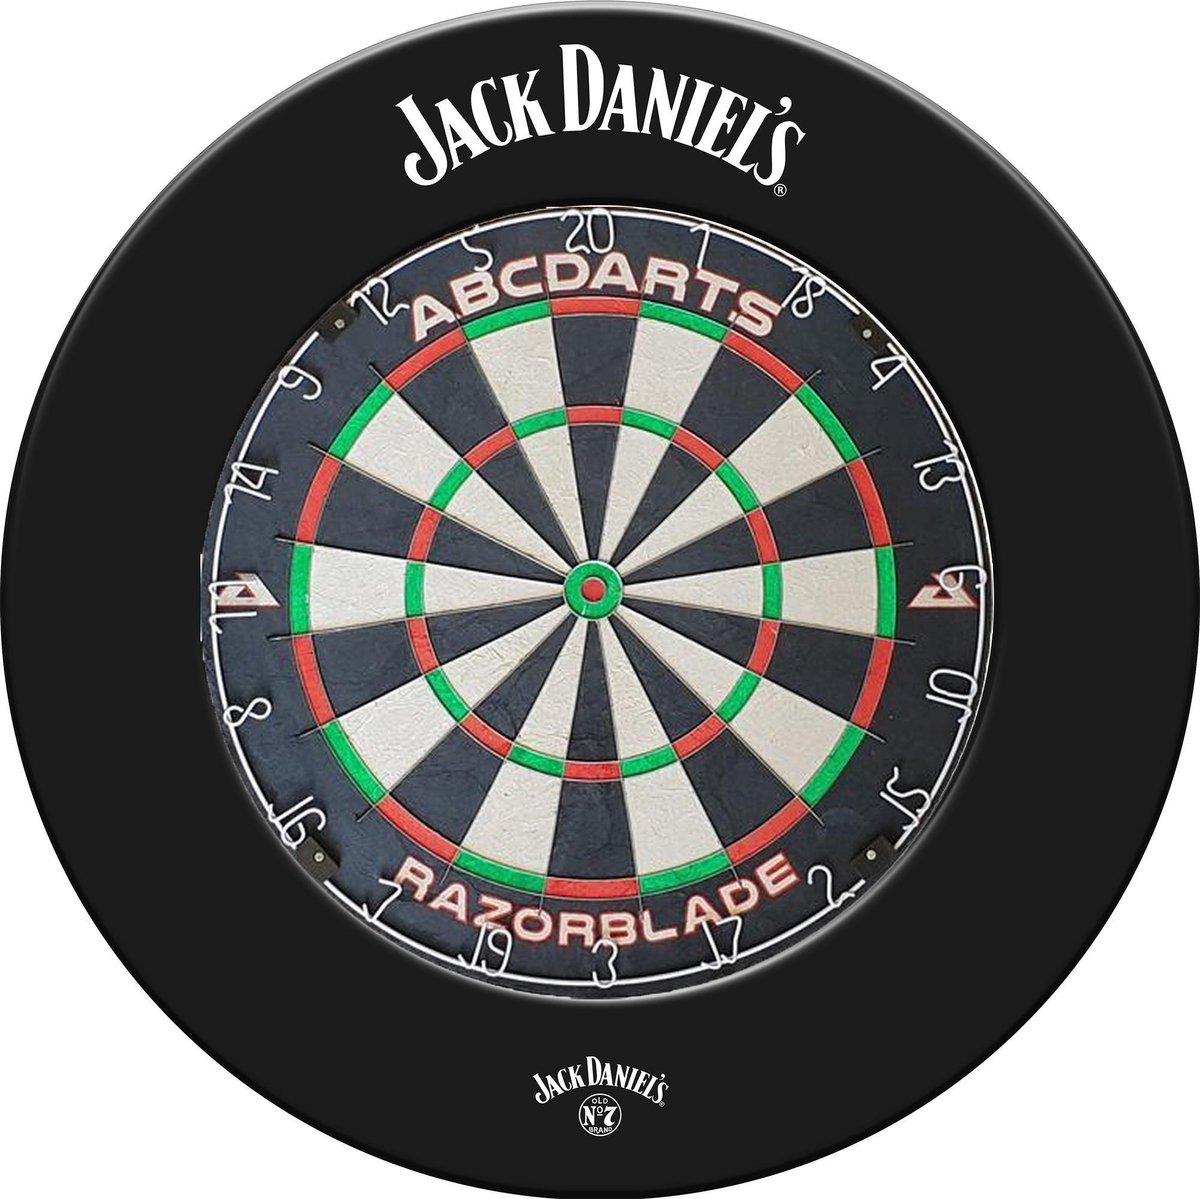 Jack Daniel's Dartbord Surroundring + Razorblade Dartbord + 2 Sets Darts